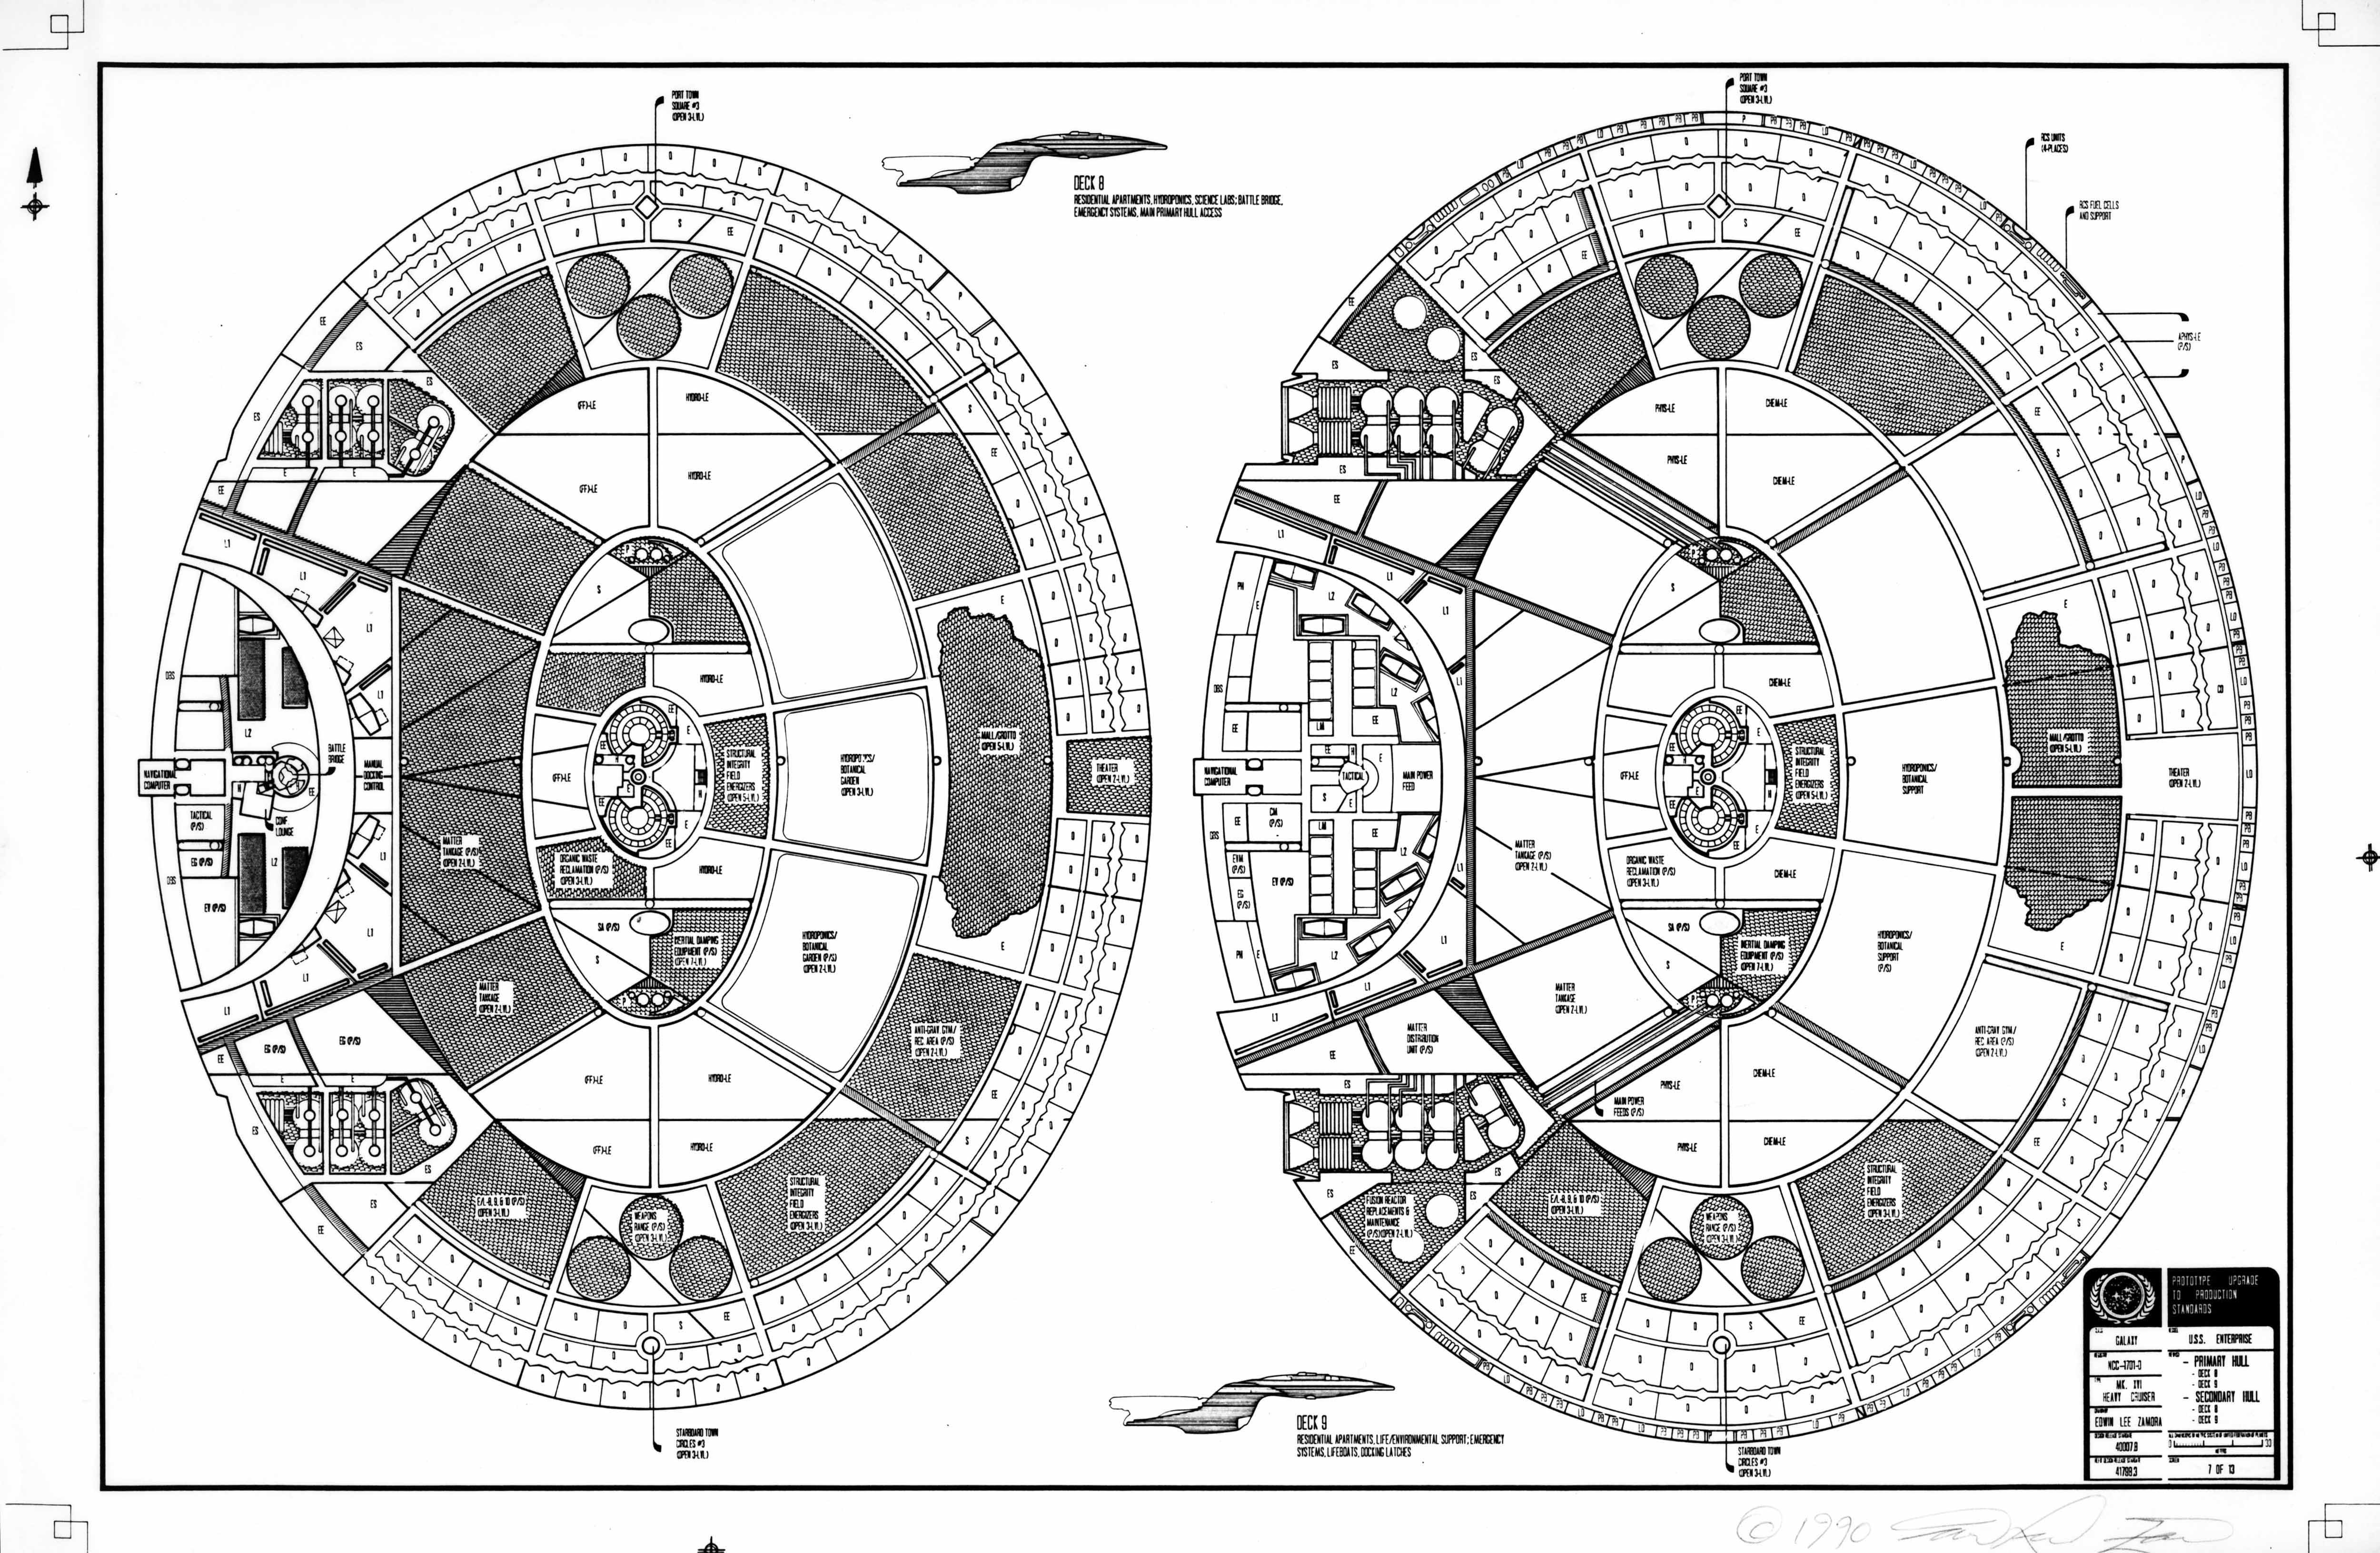 The original ed whitefire enterprise ncc 1701 d blueprints ed whitefire enterprise ncc 1701 d blueprints malvernweather Images